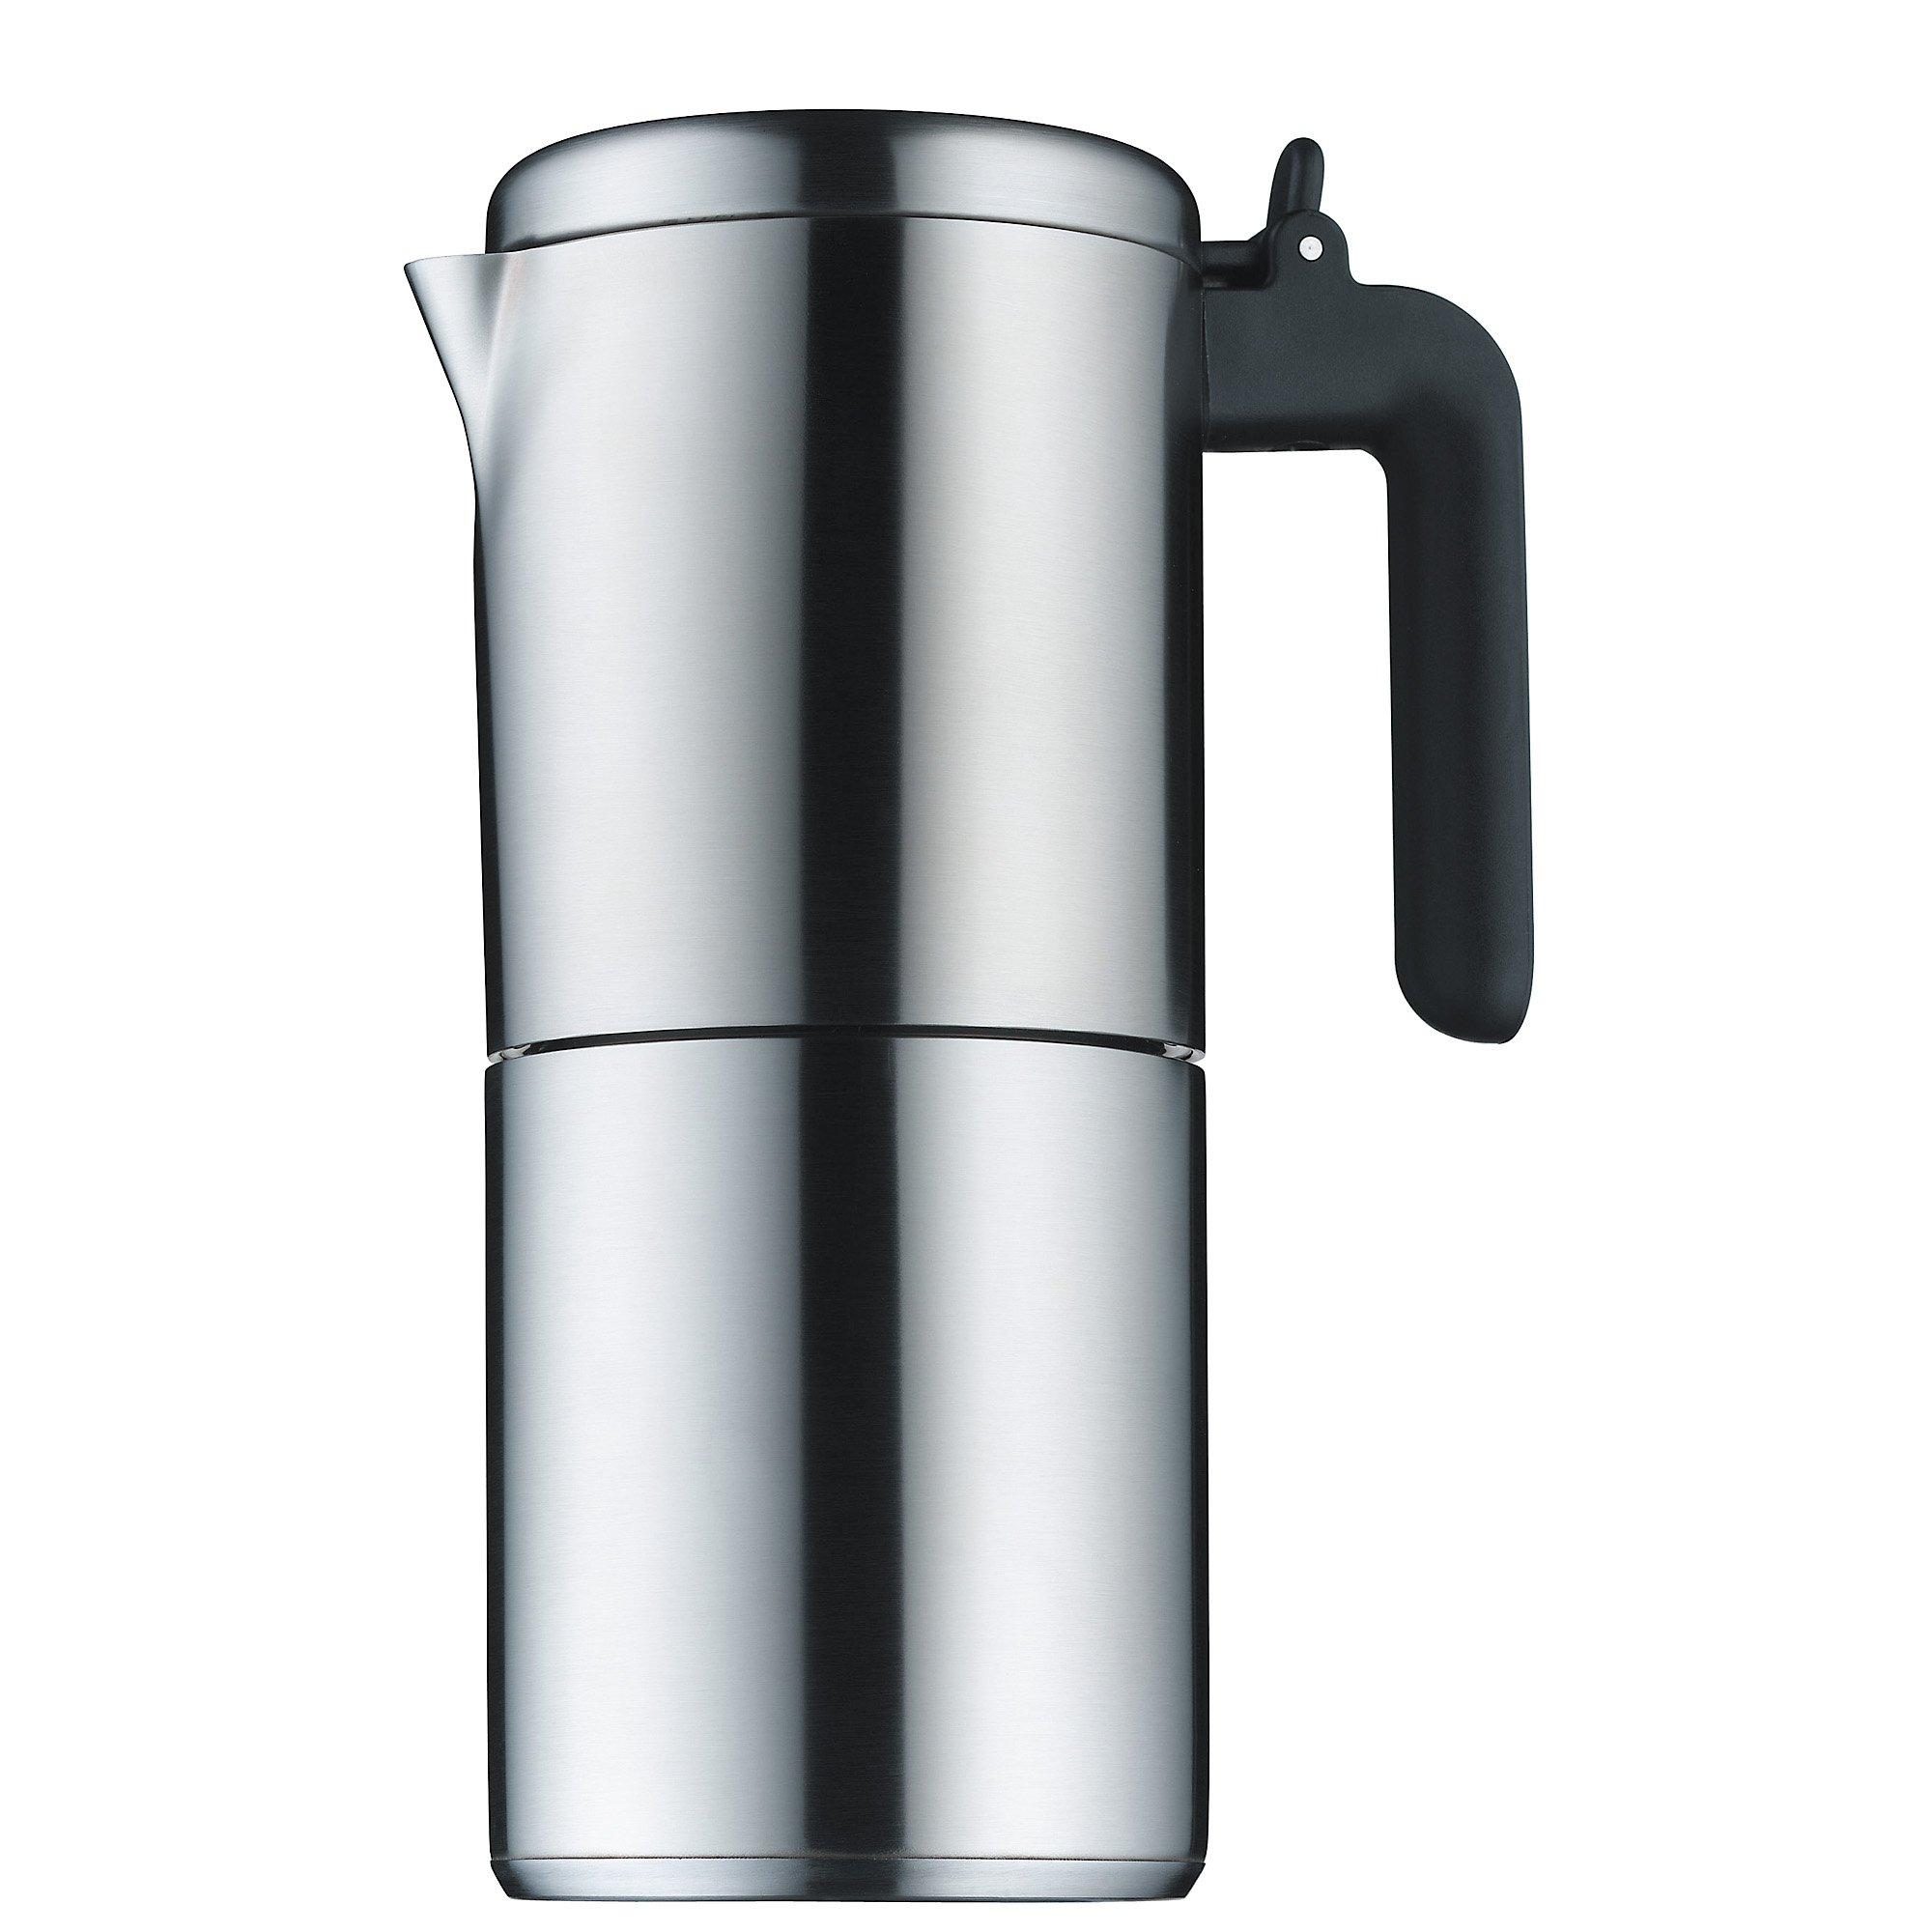 WMF Dolce Vita - Cafetera exprés, mate (6 tazas): Amazon.es: Hogar